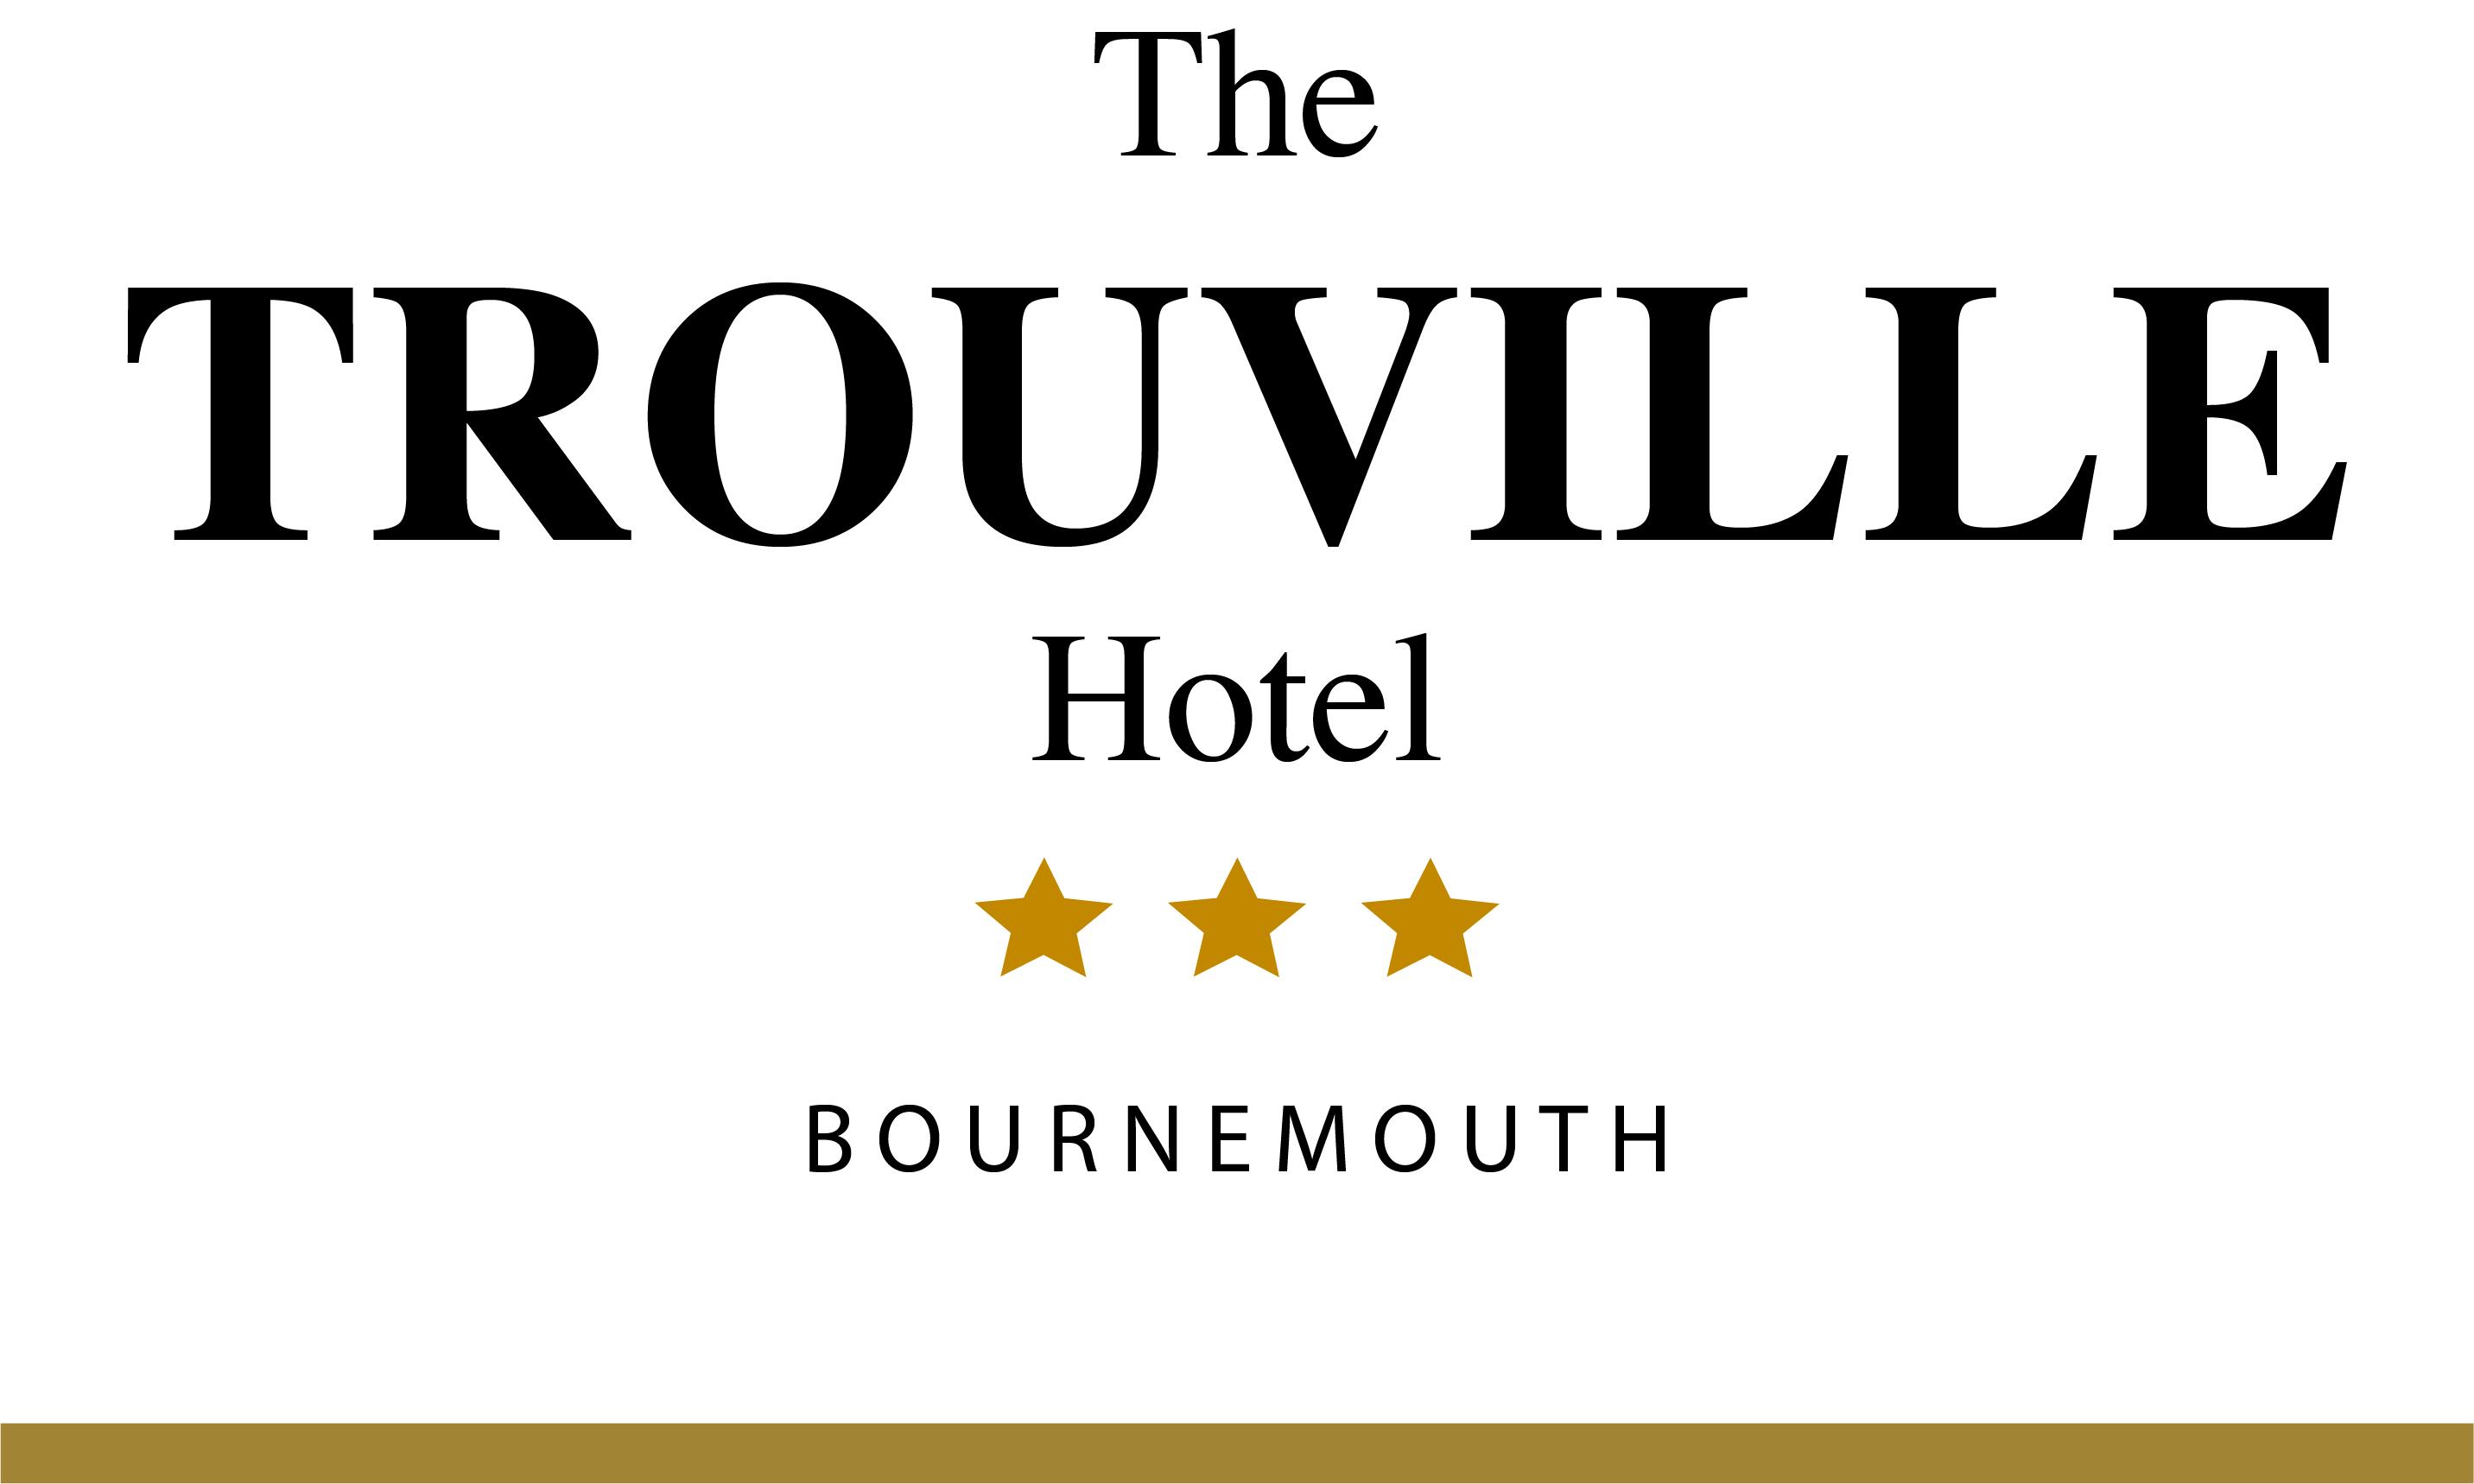 The Trouville